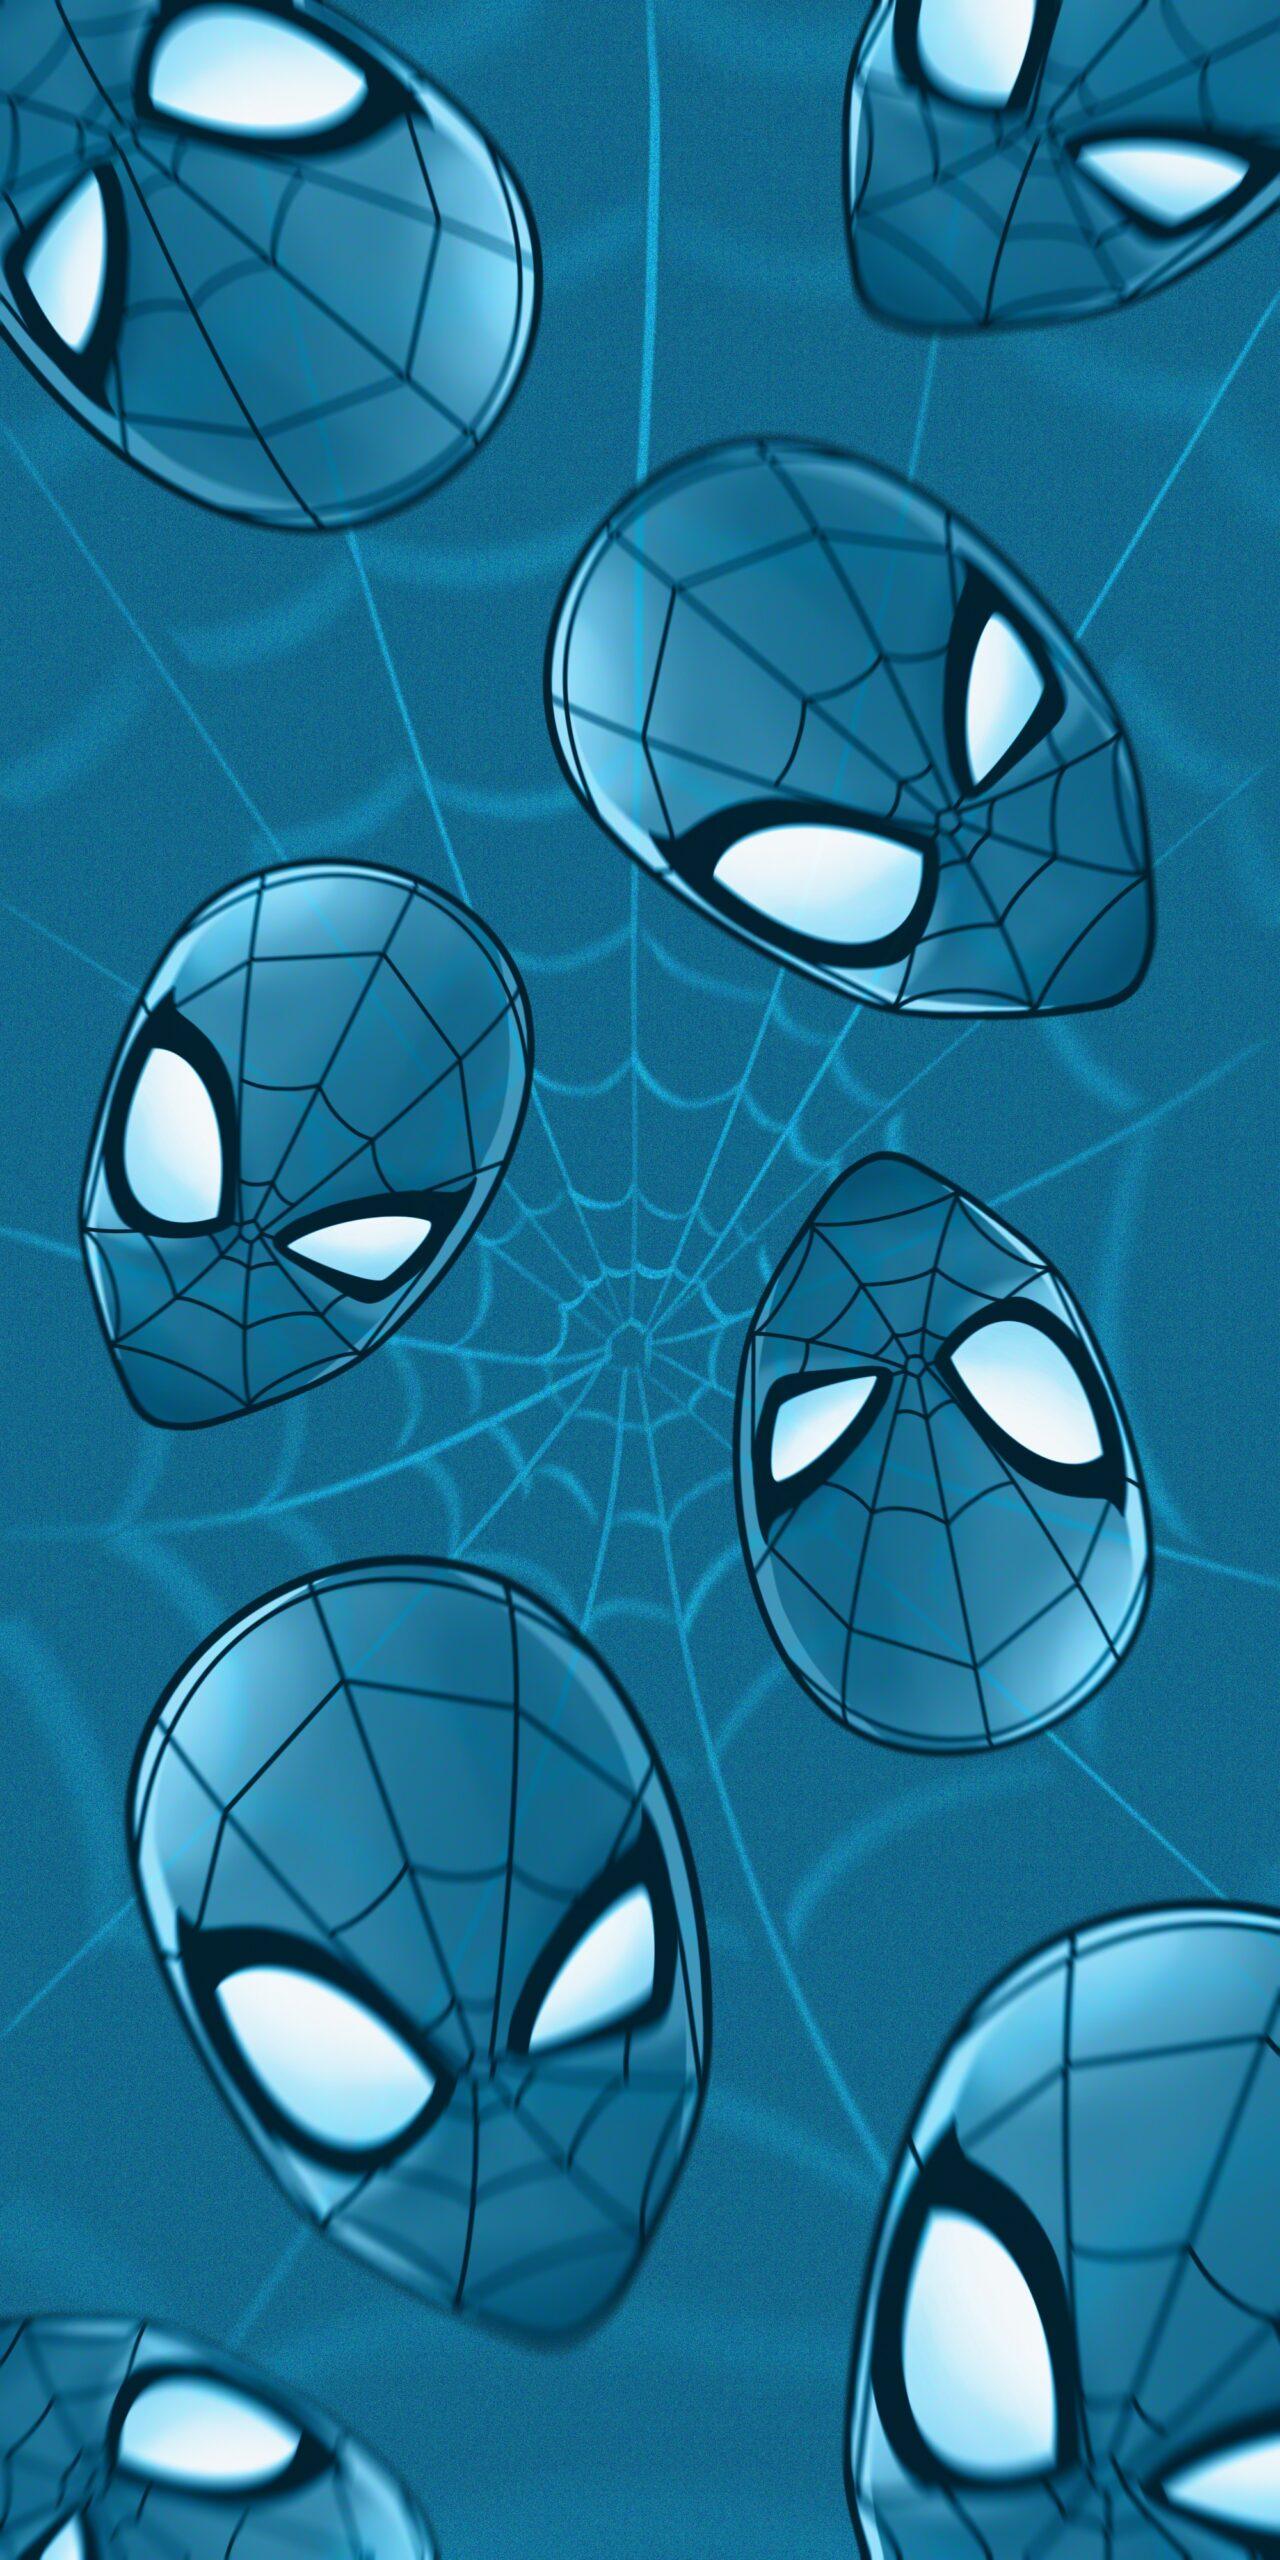 marvel spider-man blue background wallpaper